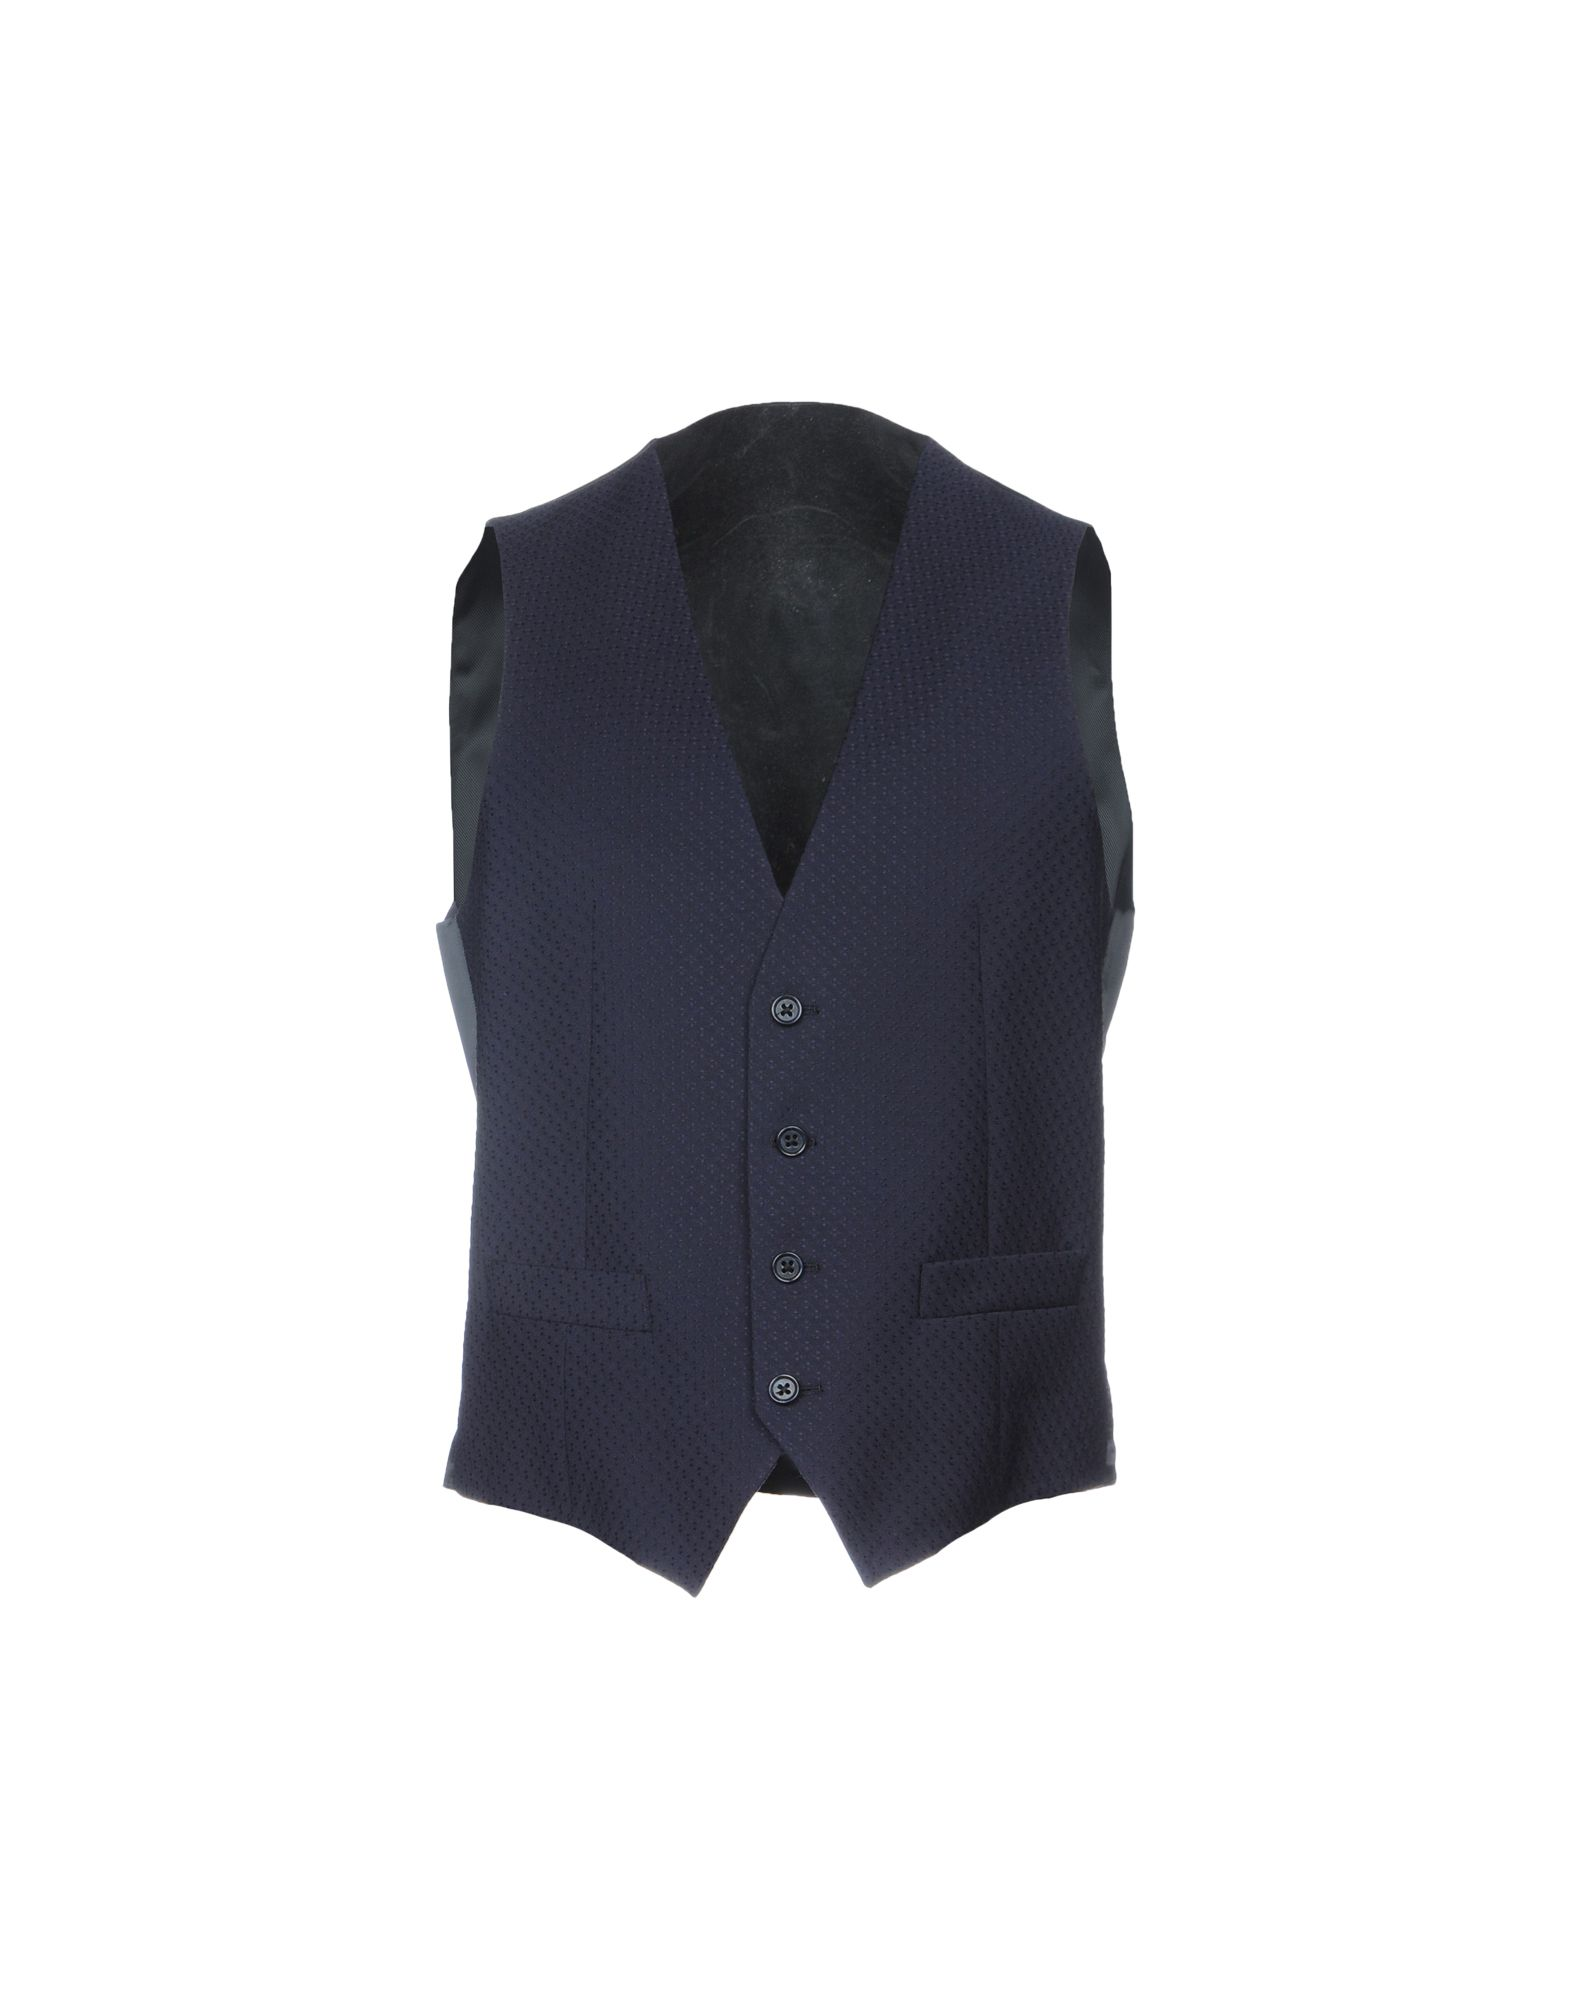 CC COLLECTION CORNELIANI Suit Vest in Dark Blue